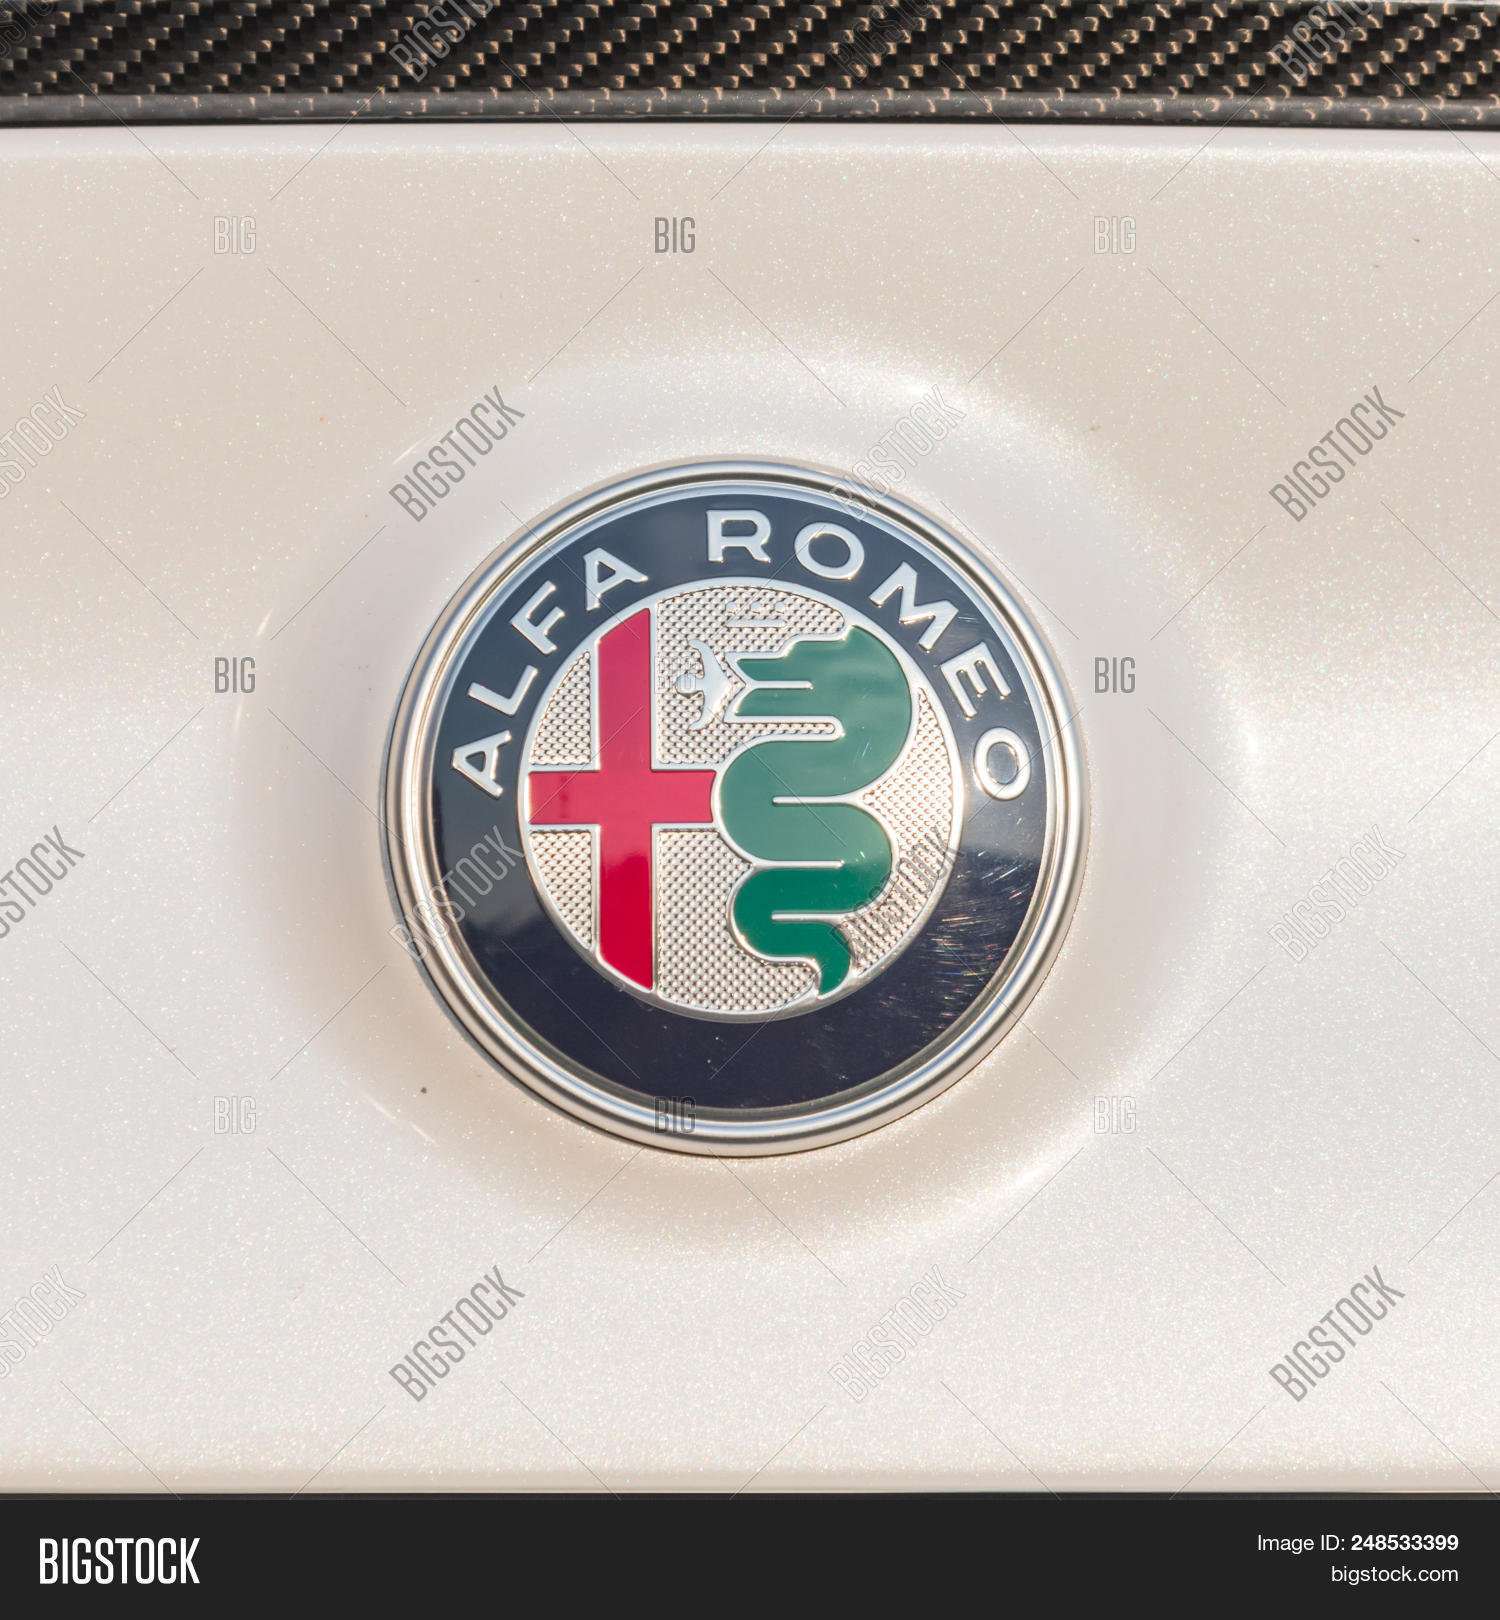 Alfa Romeo Automobiles Image Photo Free Trial Bigstock Symbol Logo On Sport Car Trunk